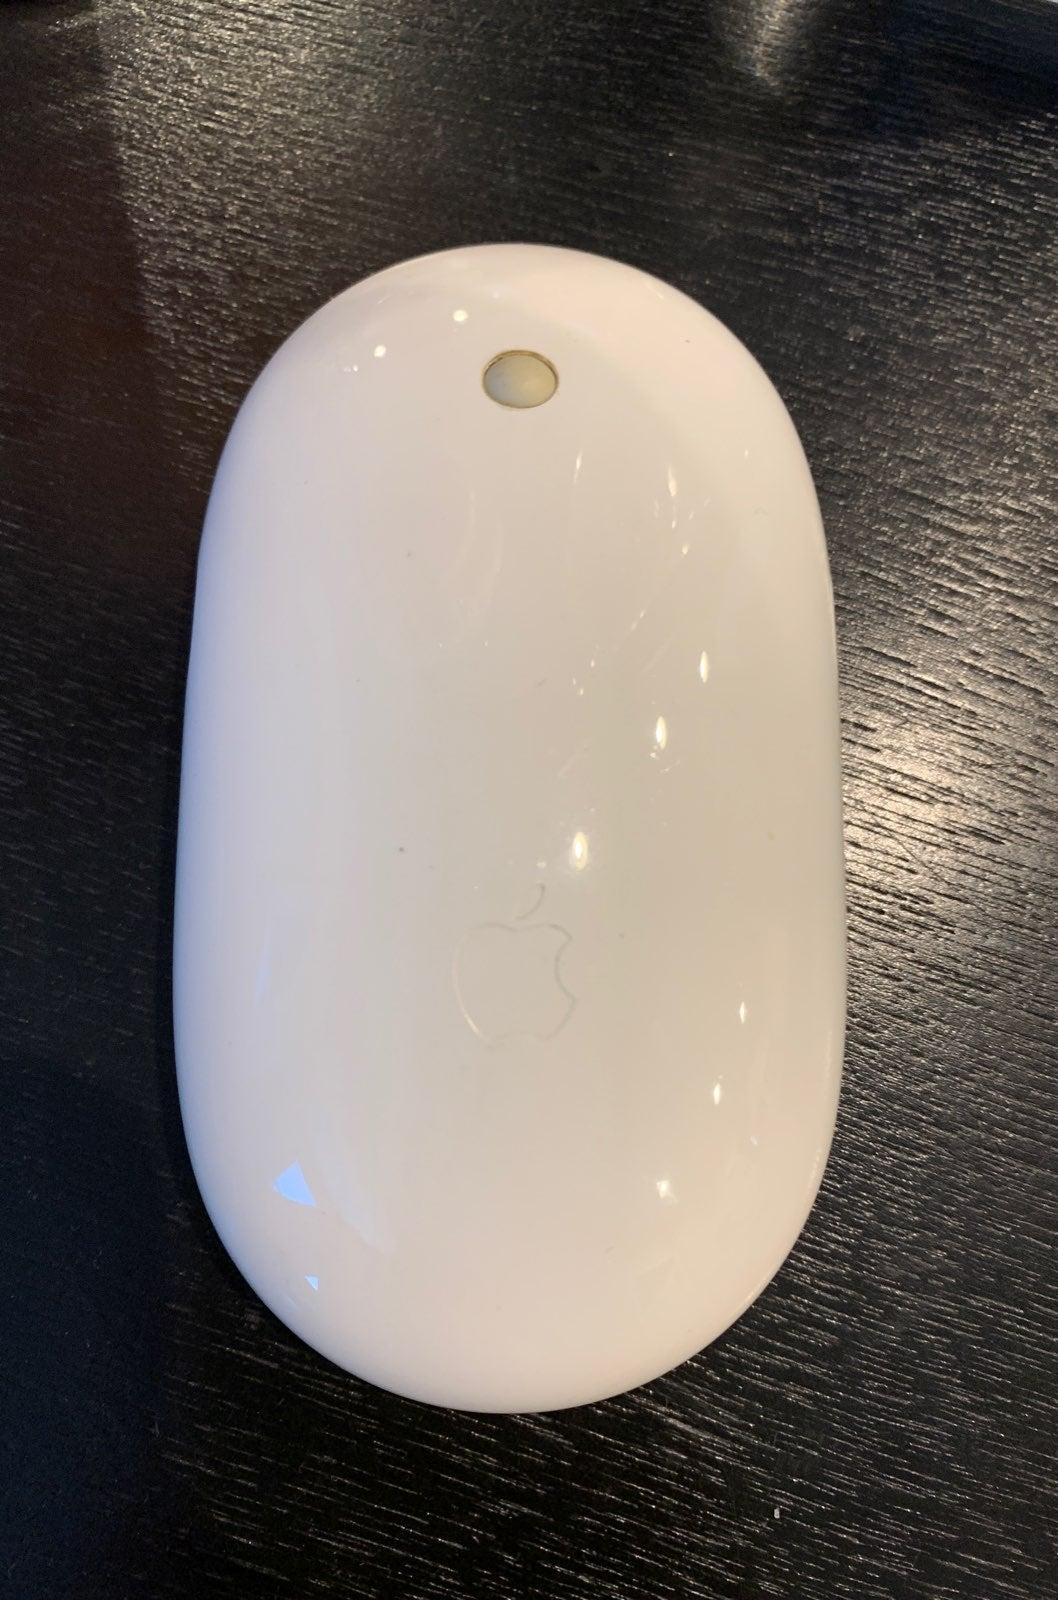 Apple wireless mouse model A1197